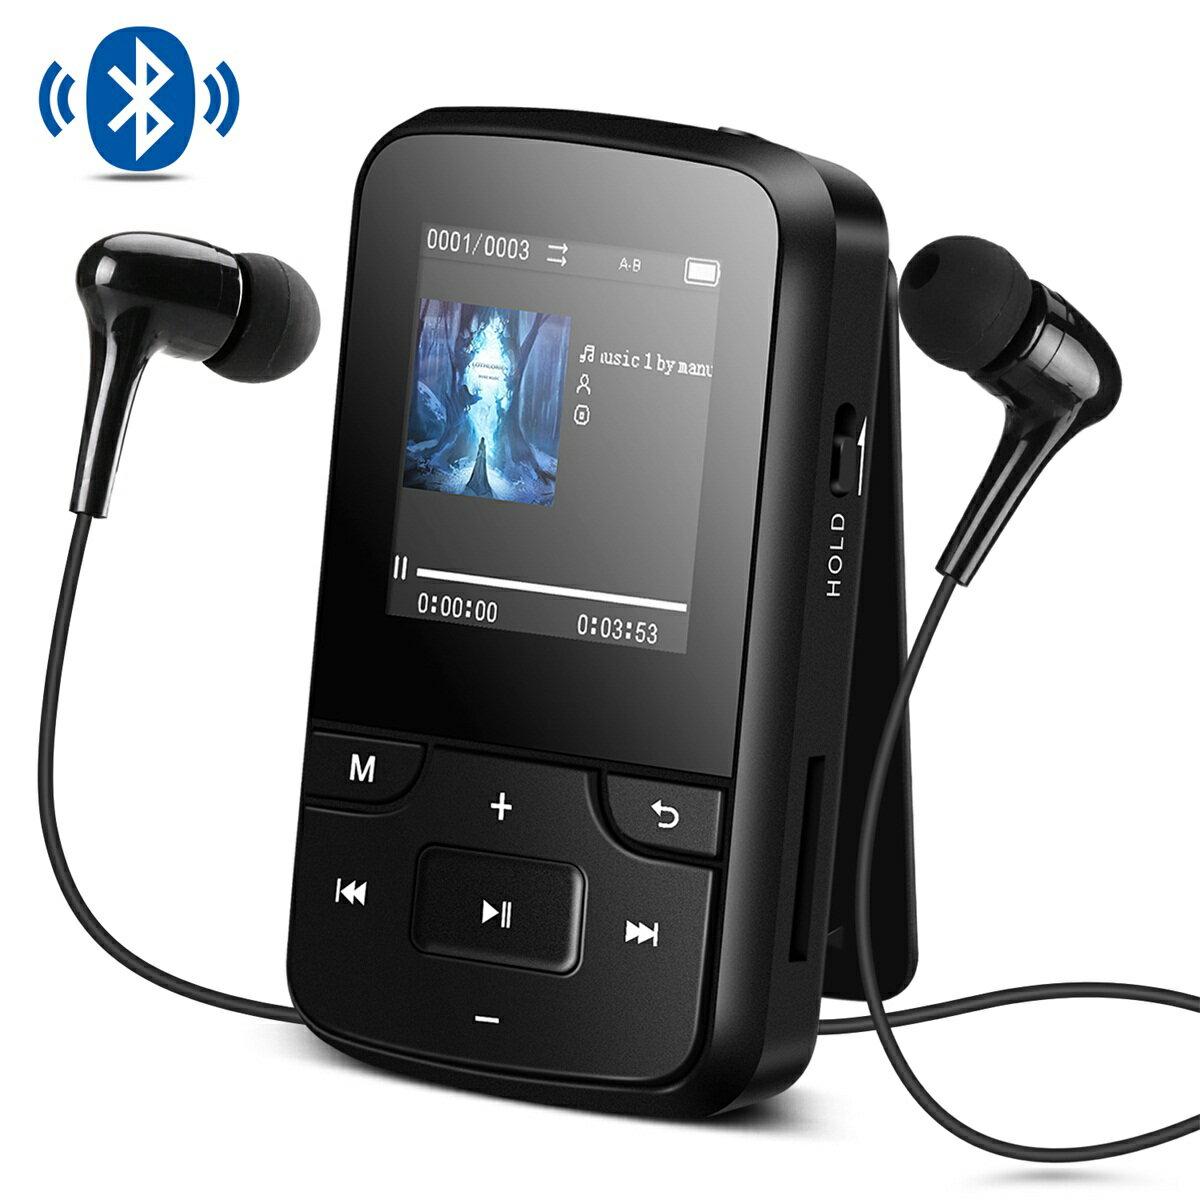 AGPTEK 音楽プレーヤー ミュージック プレーヤー Bluetooth搭載 クリップ ミニ MP3プレーヤー 8GB内蔵 高音質 FMラジオ/録音 イヤホン&アームバンド&防汗ケース付属 最大128GBマイクロSDカードに対応 ブラック G6